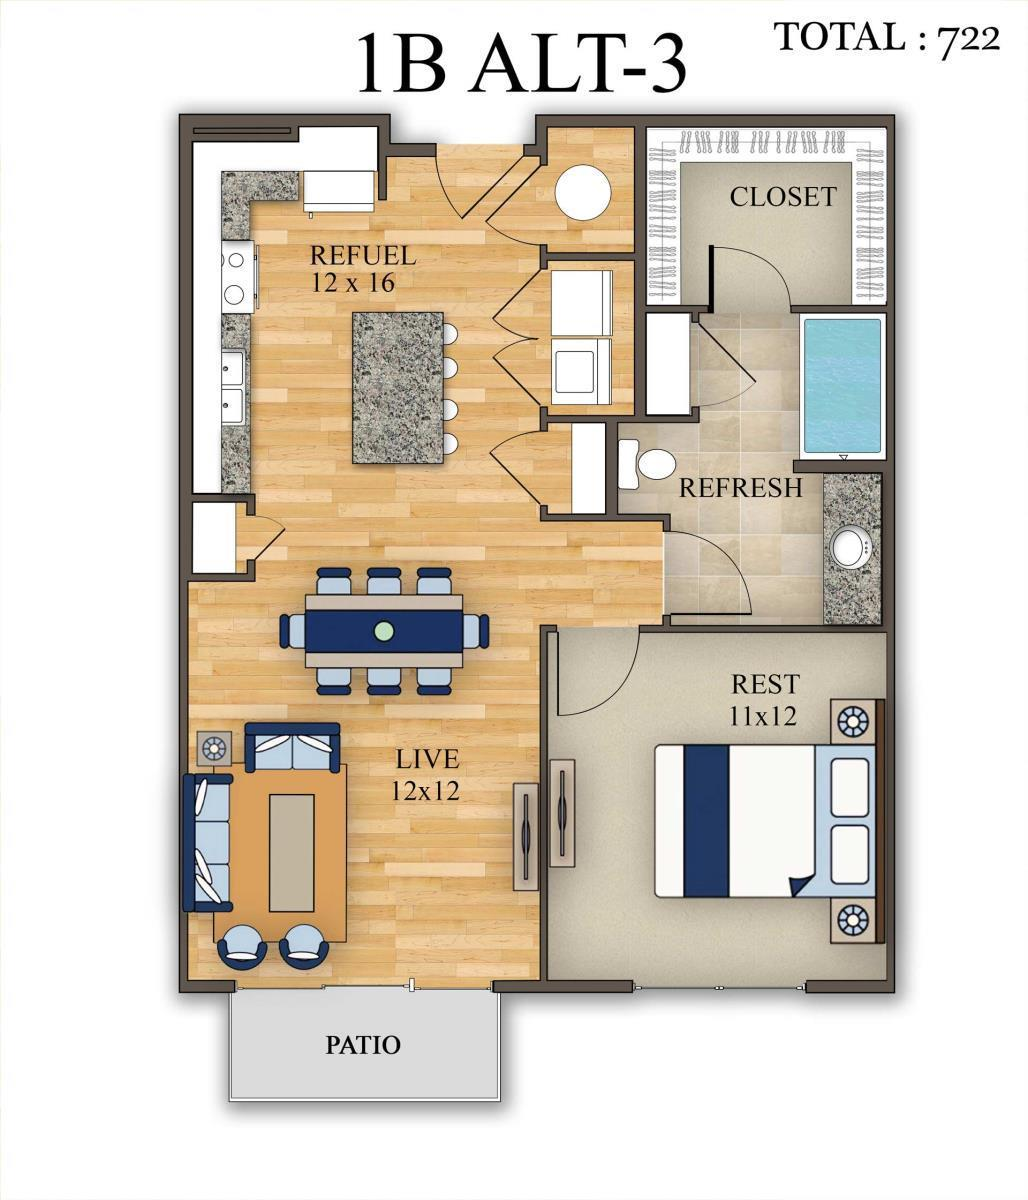 722 sq. ft. 1B Alt 3 floor plan